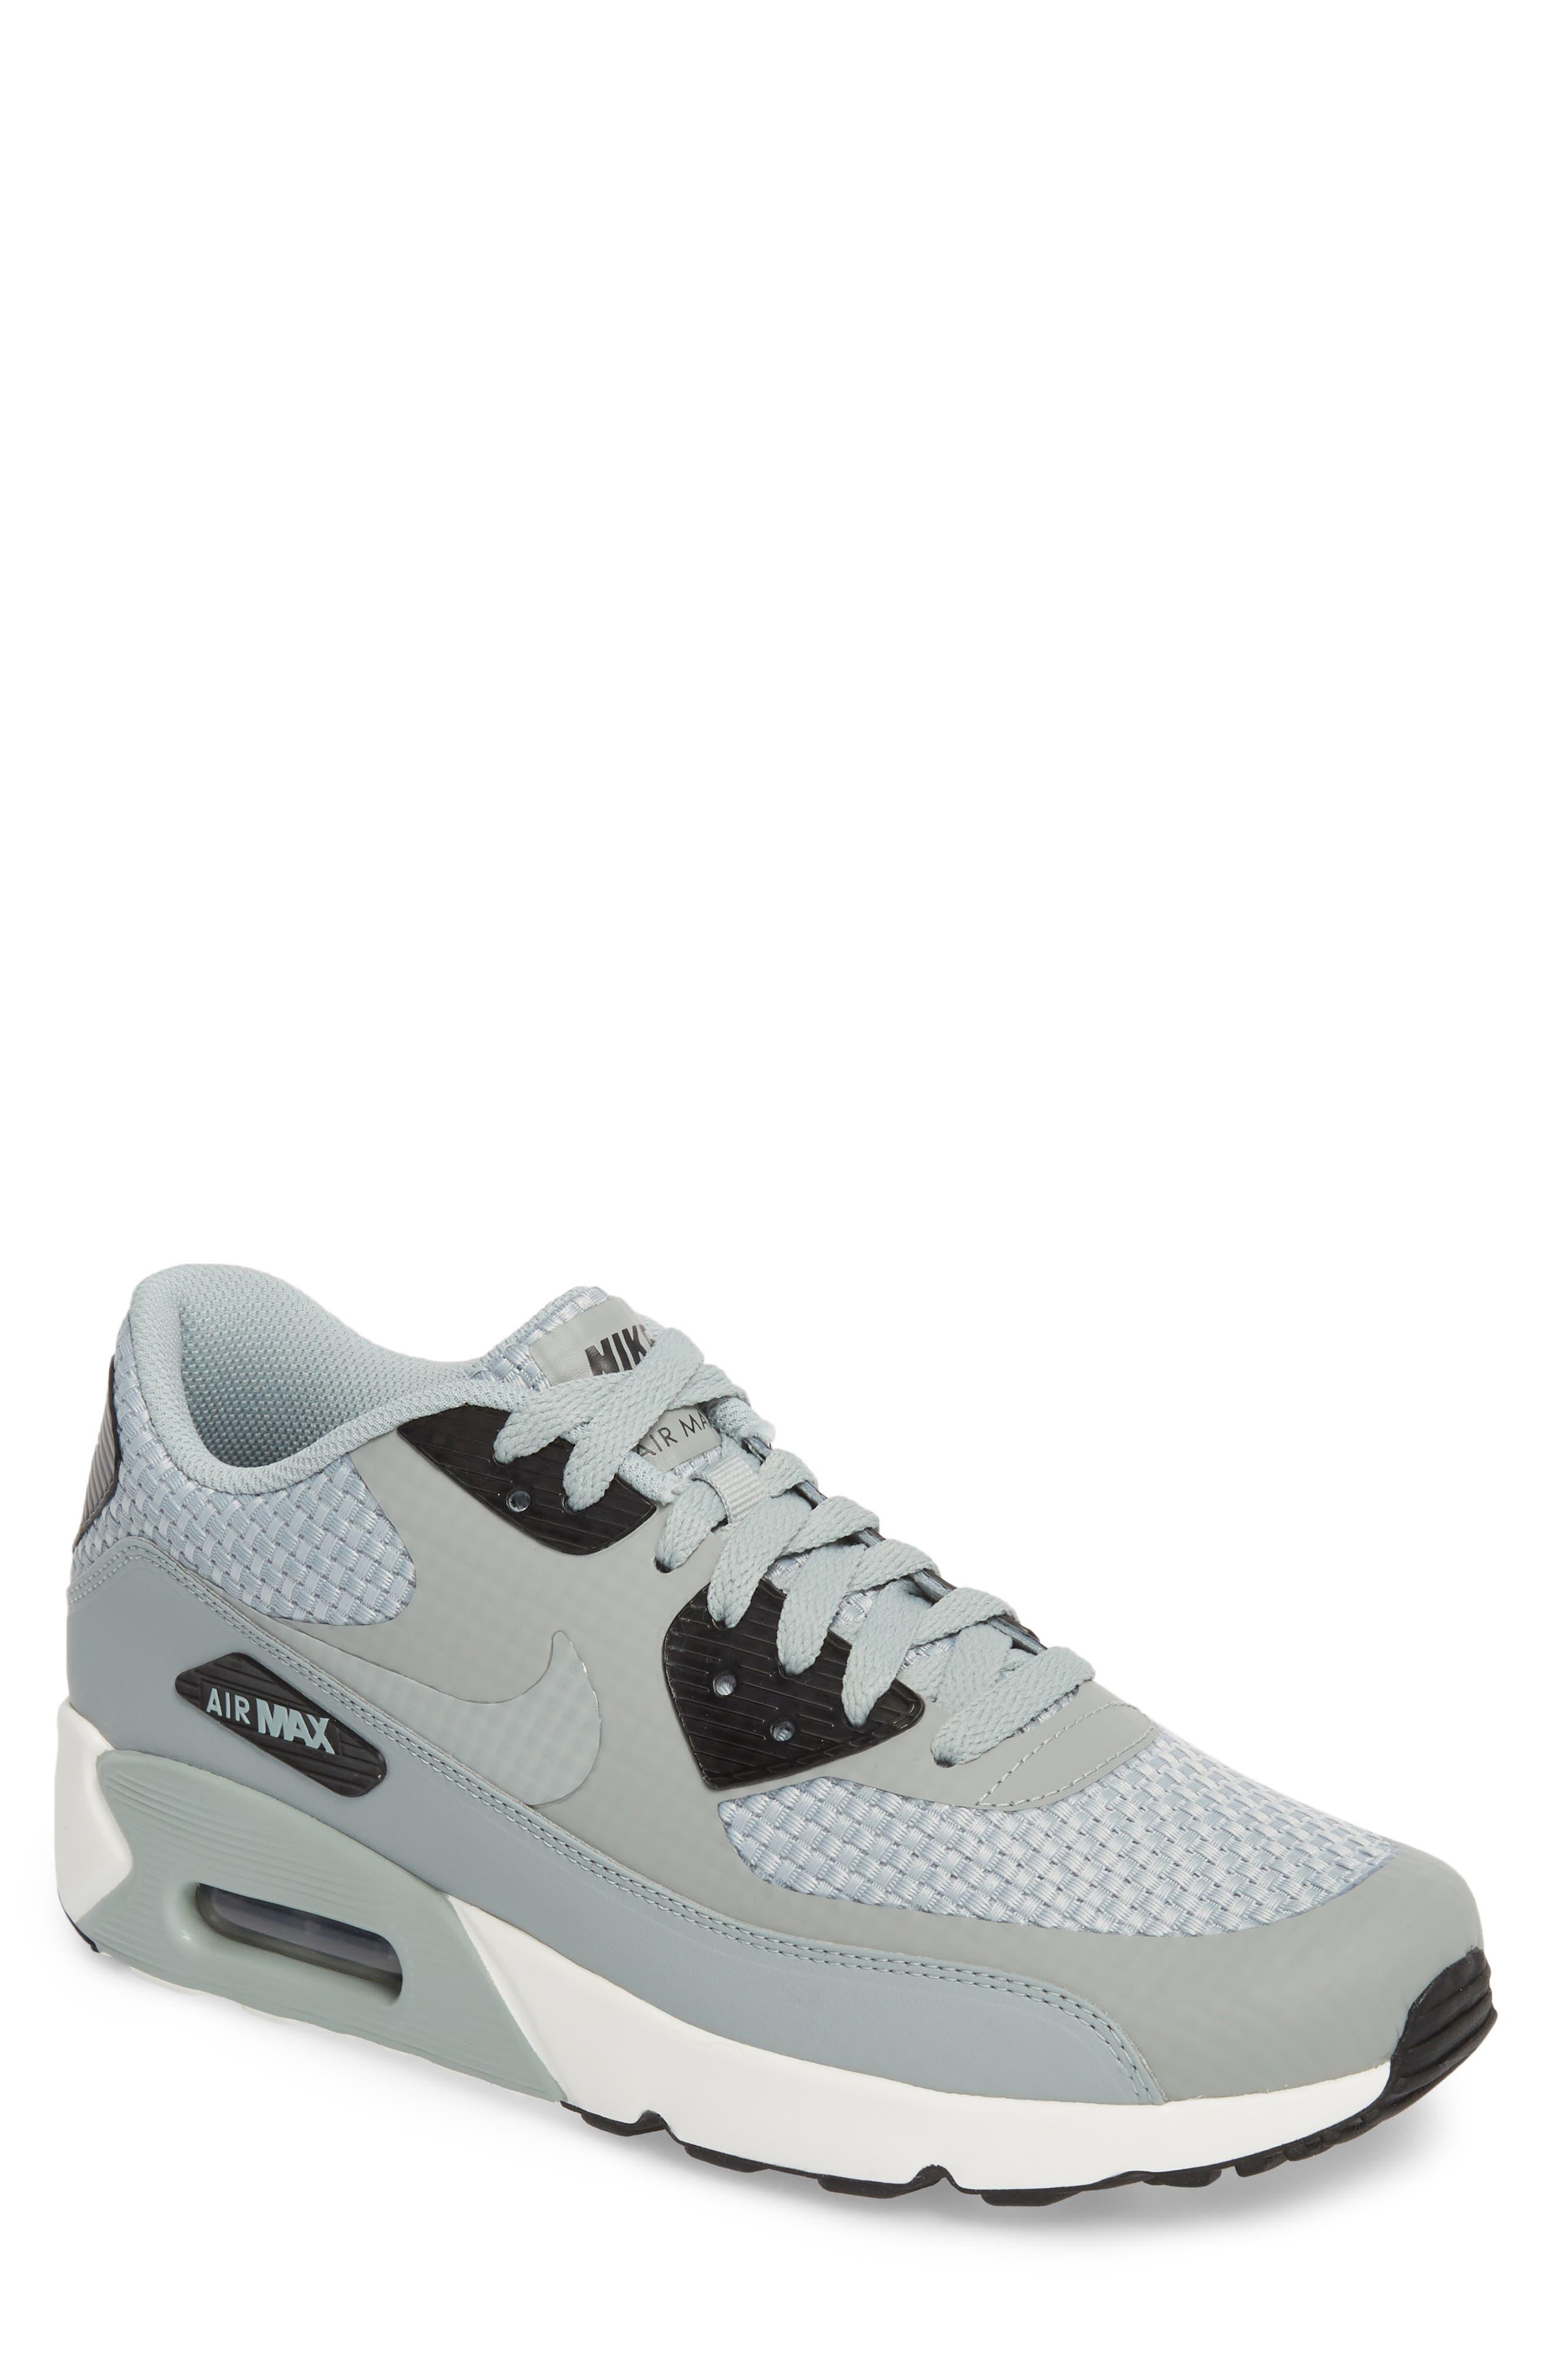 Air Max 90 Ultra 2.0 SE Sneaker,                             Main thumbnail 2, color,